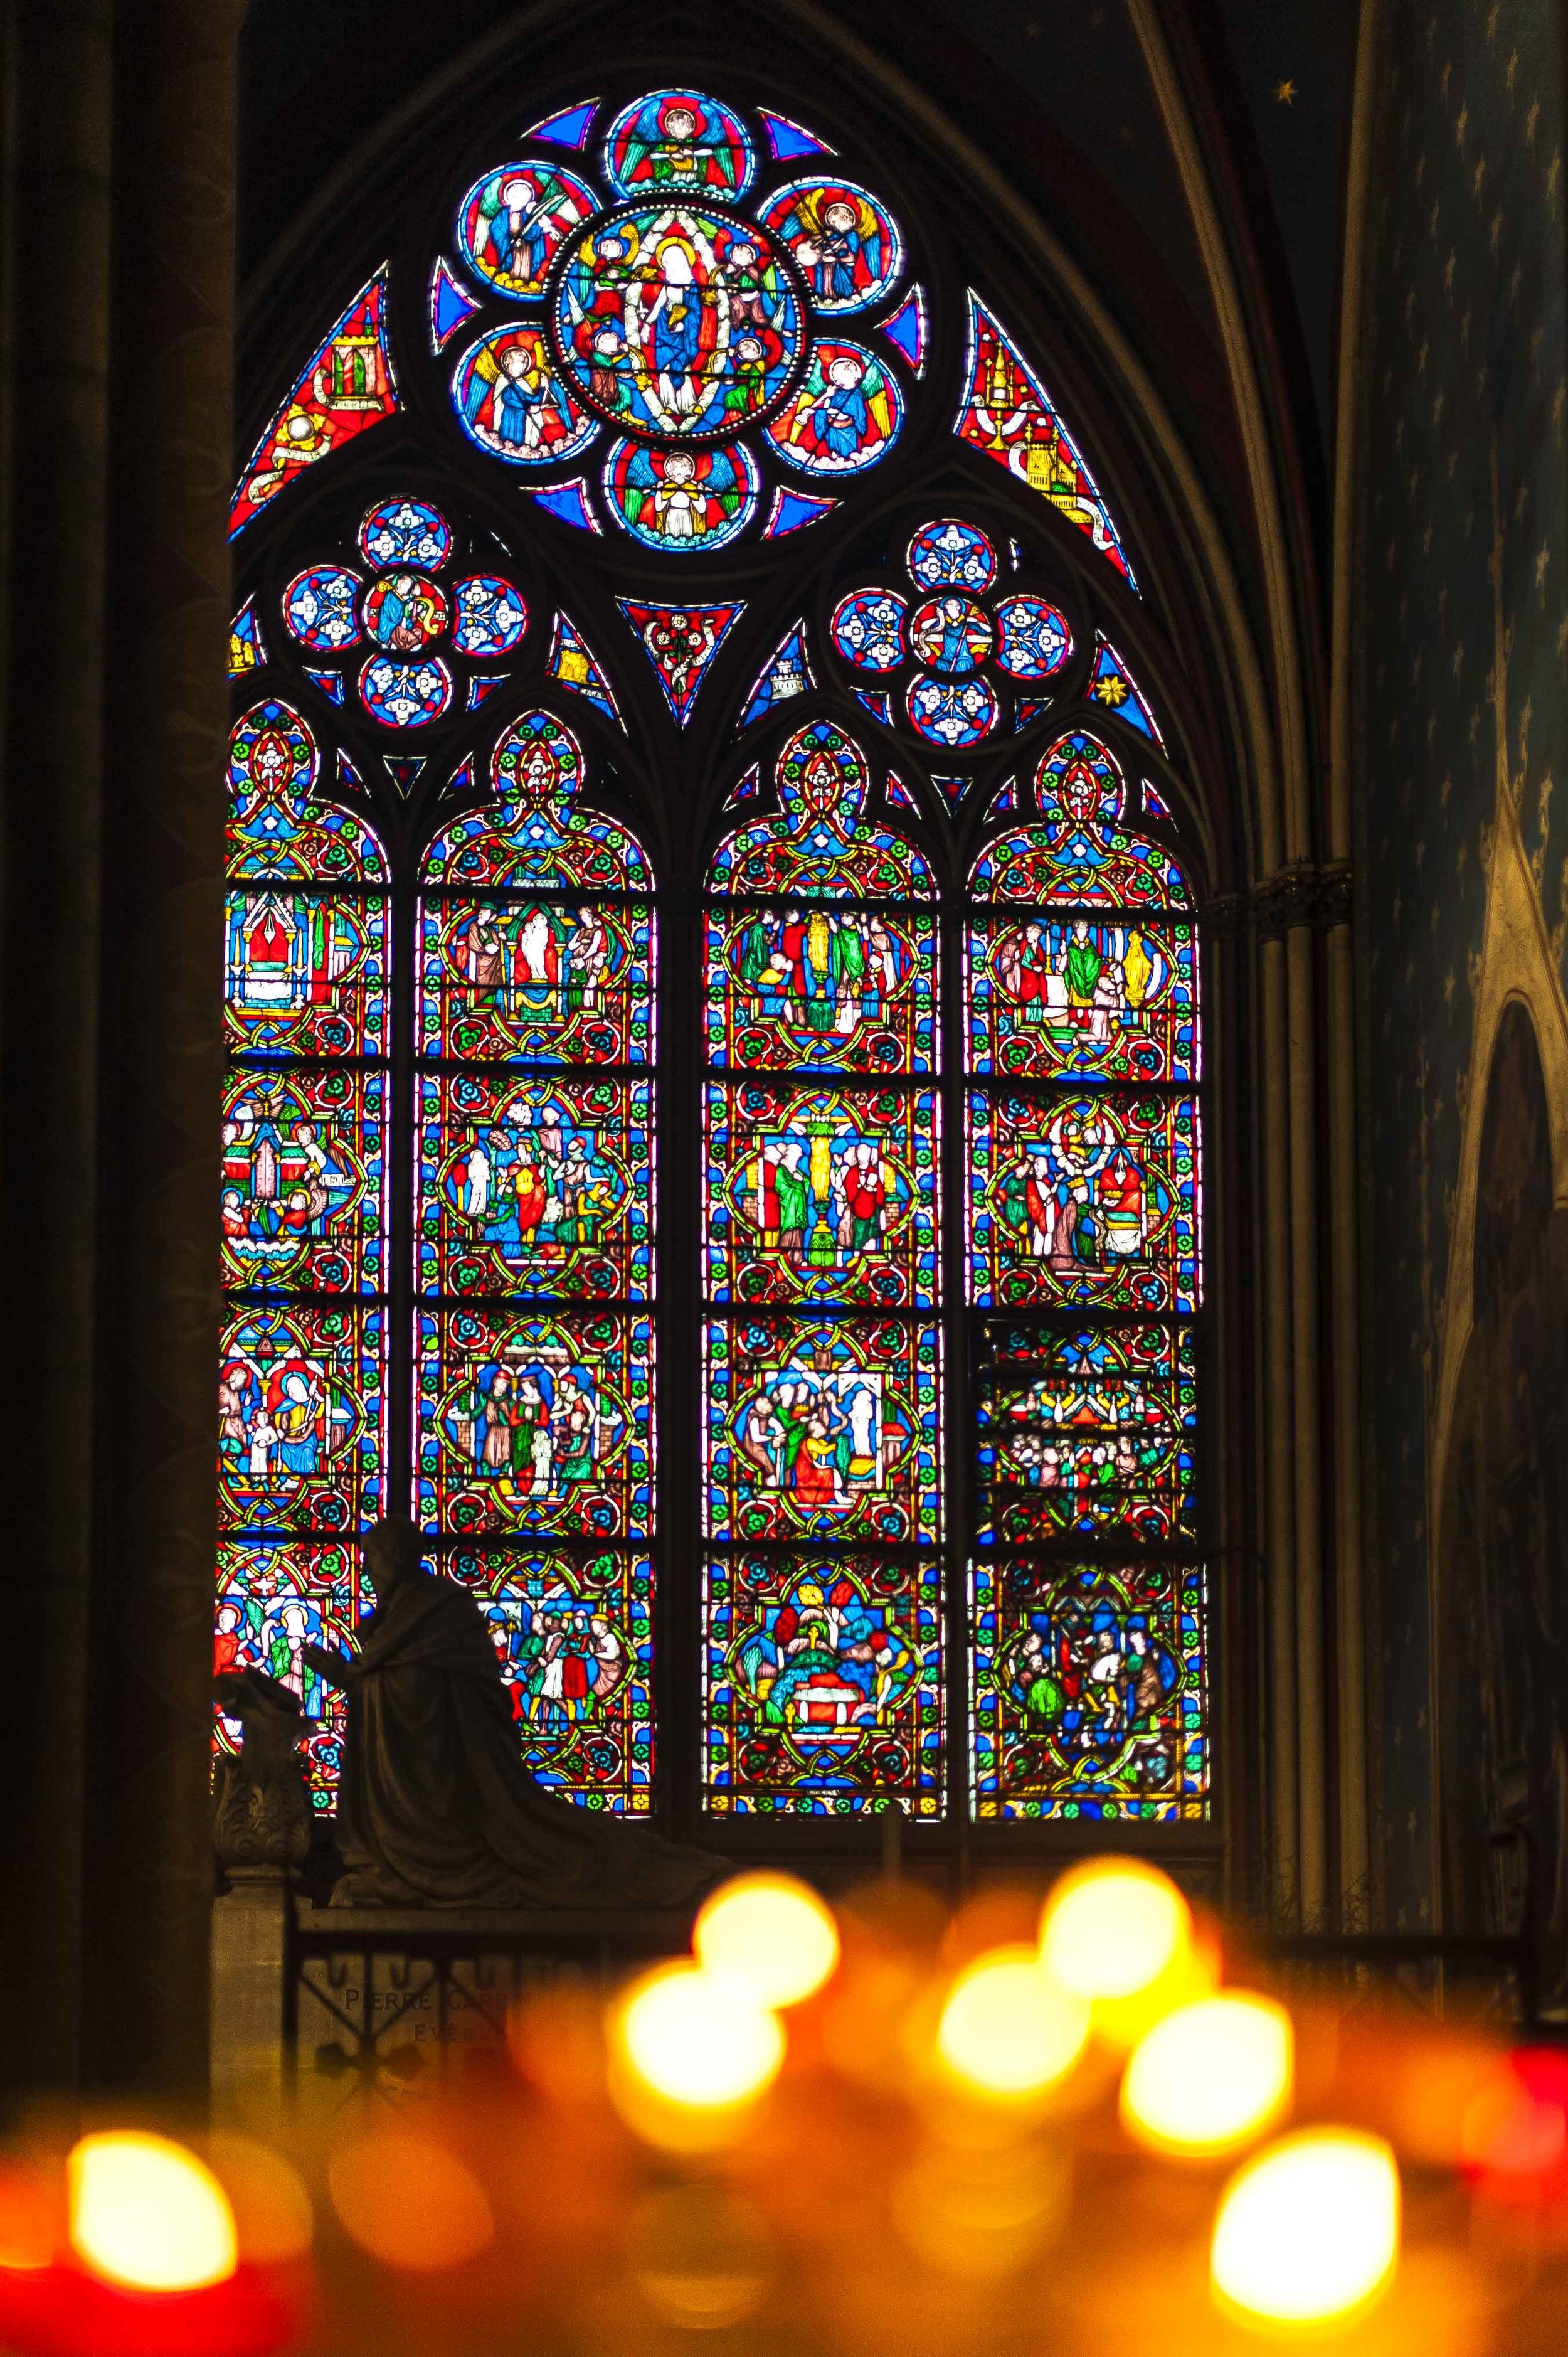 Paris_Nikon_20170507_003.jpg